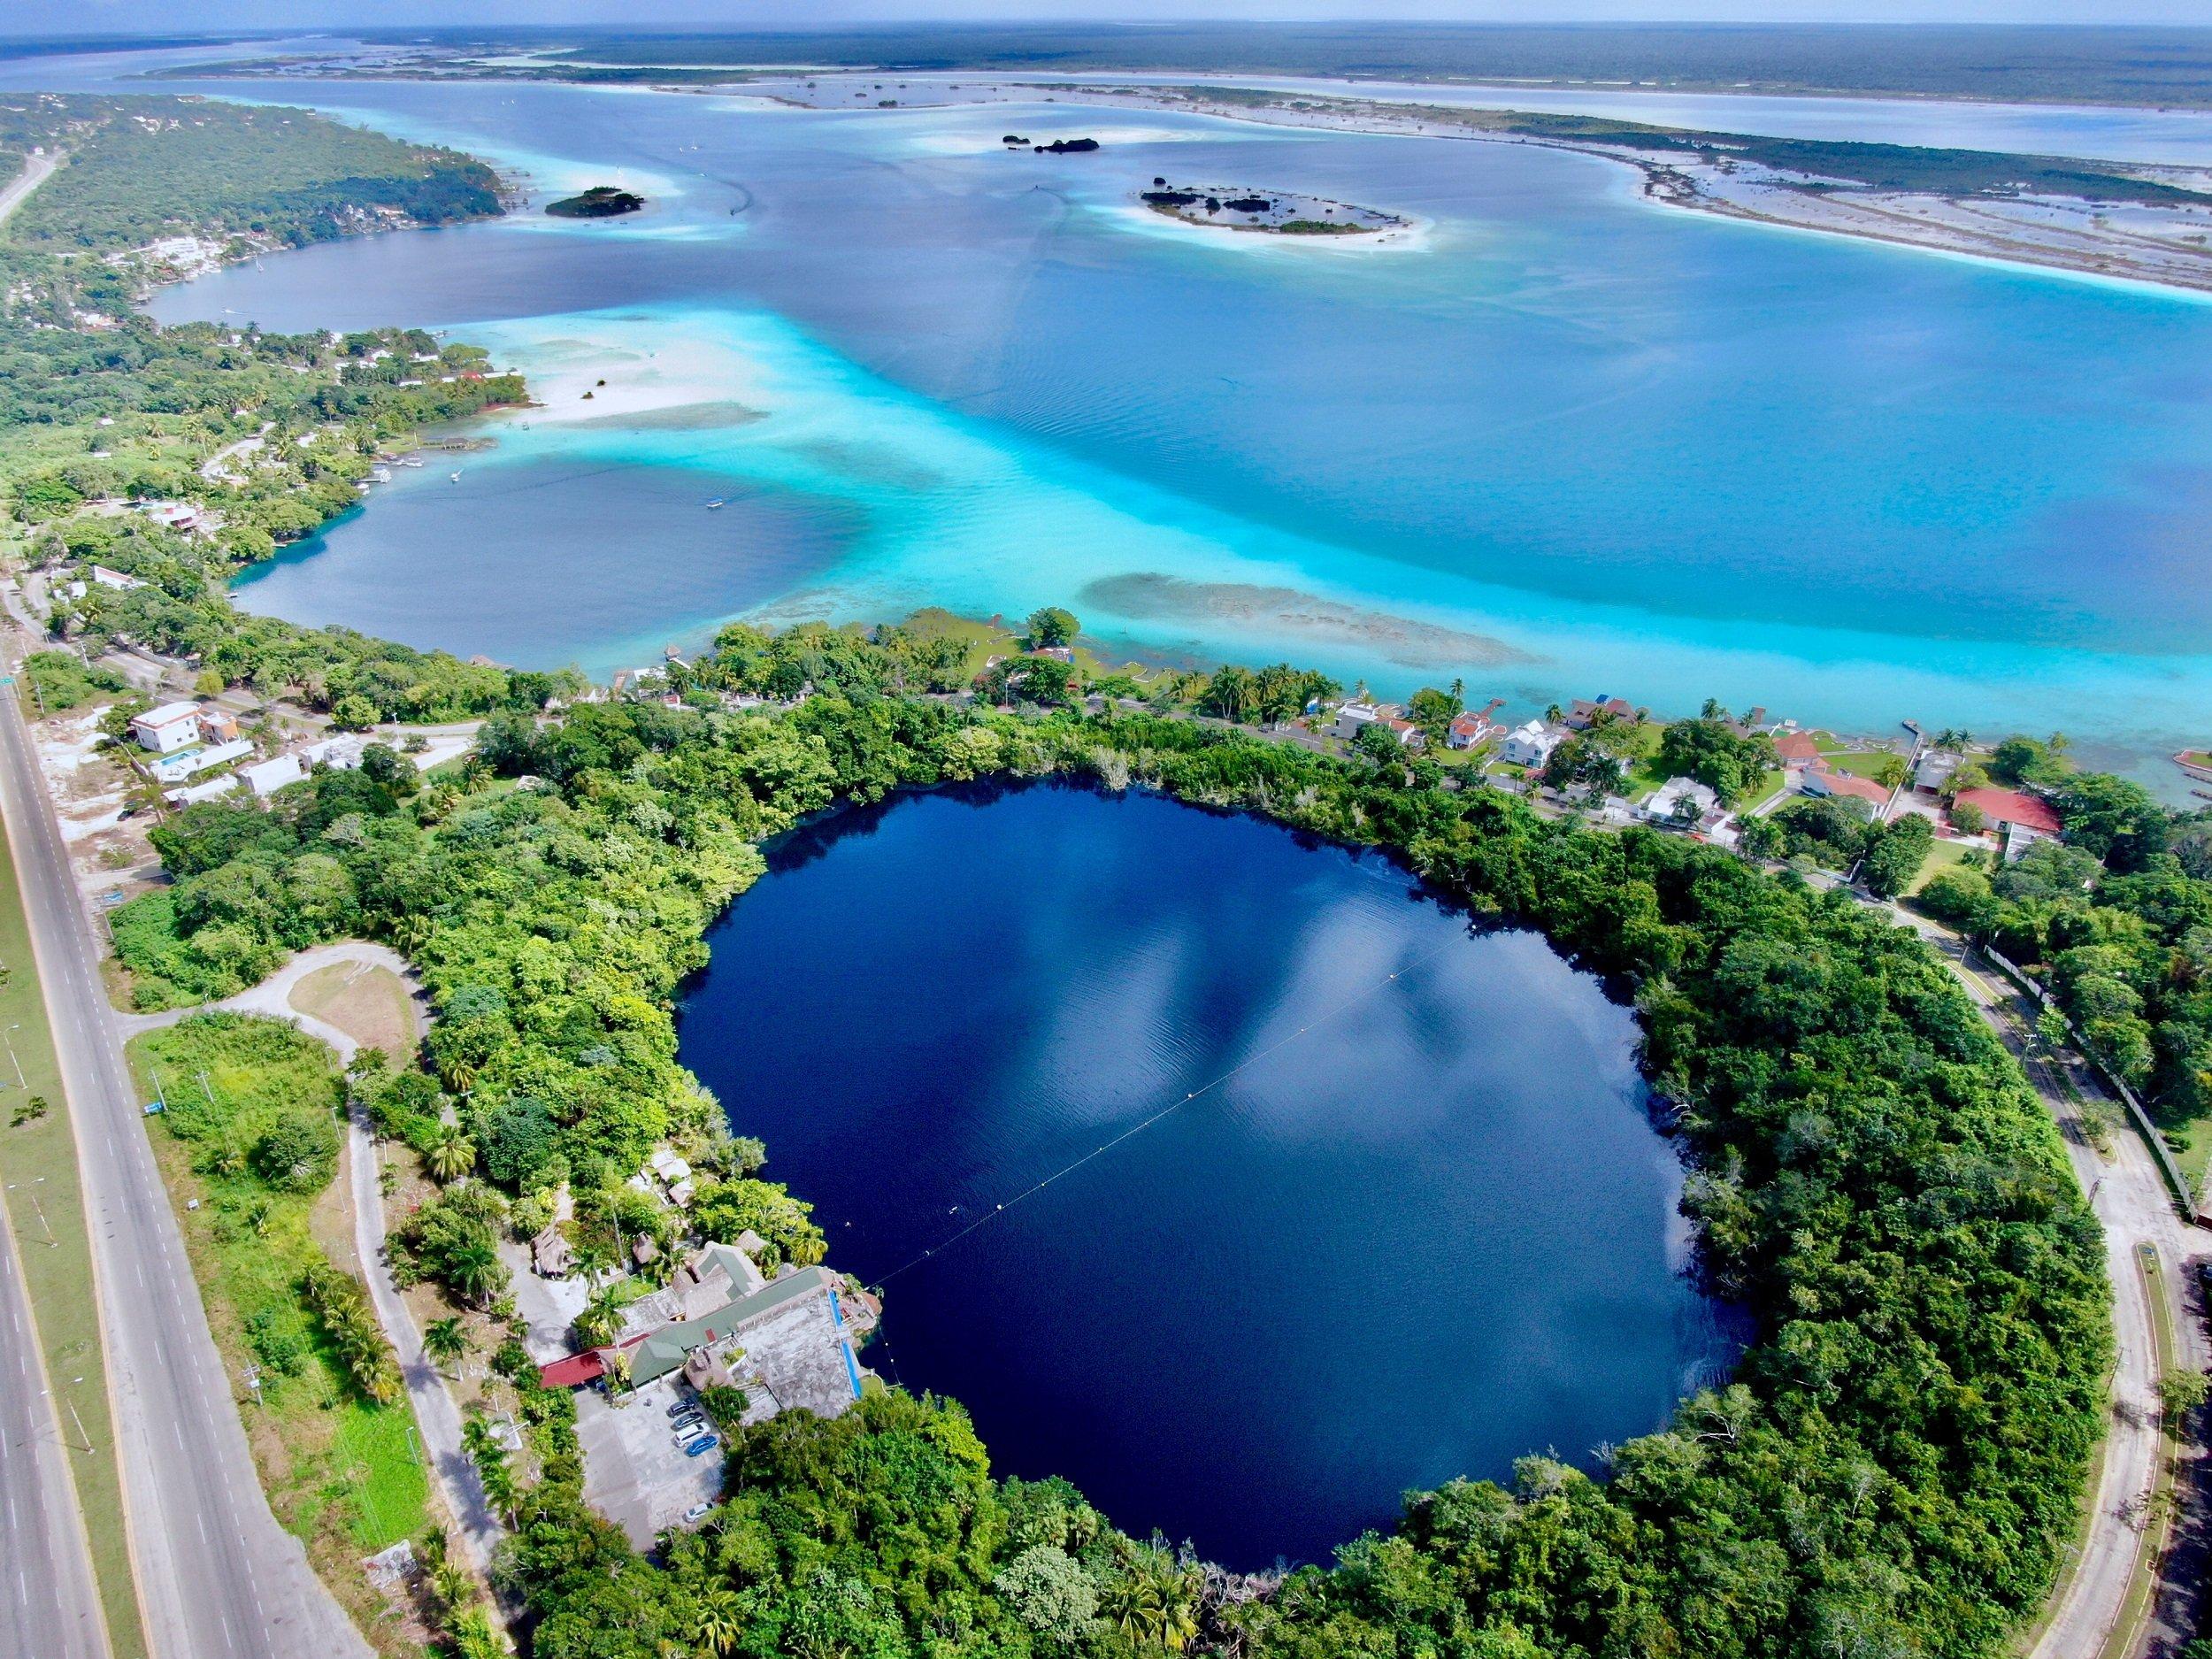 Bacalar - Lagoon Of The 7 Colors Sailing Experience From The Riviera Maya